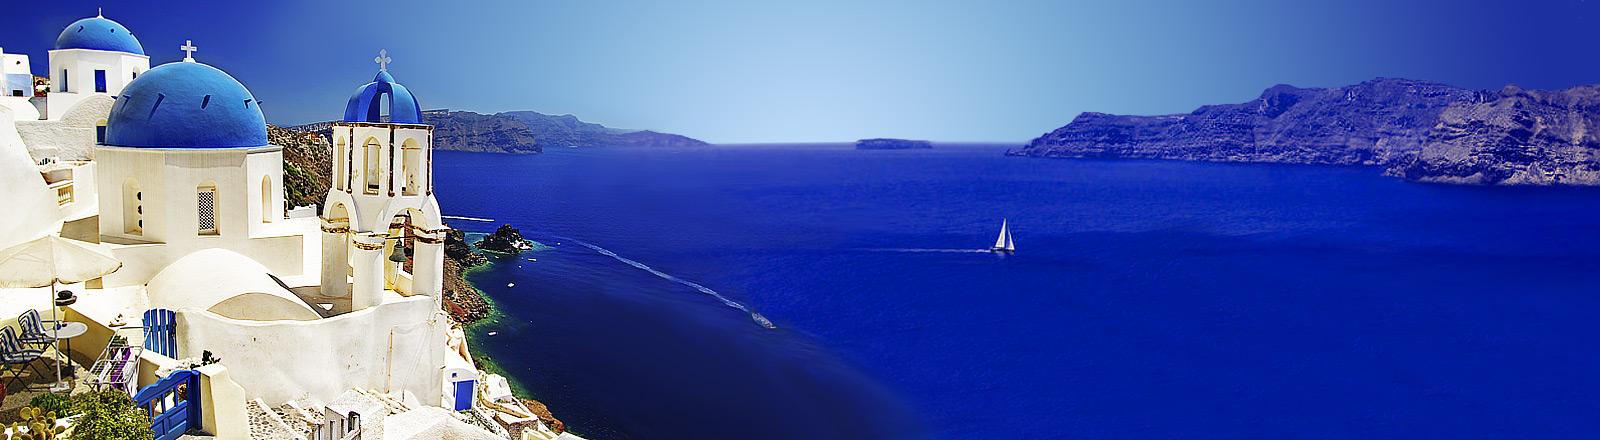 greece vacation destinations - photo #10